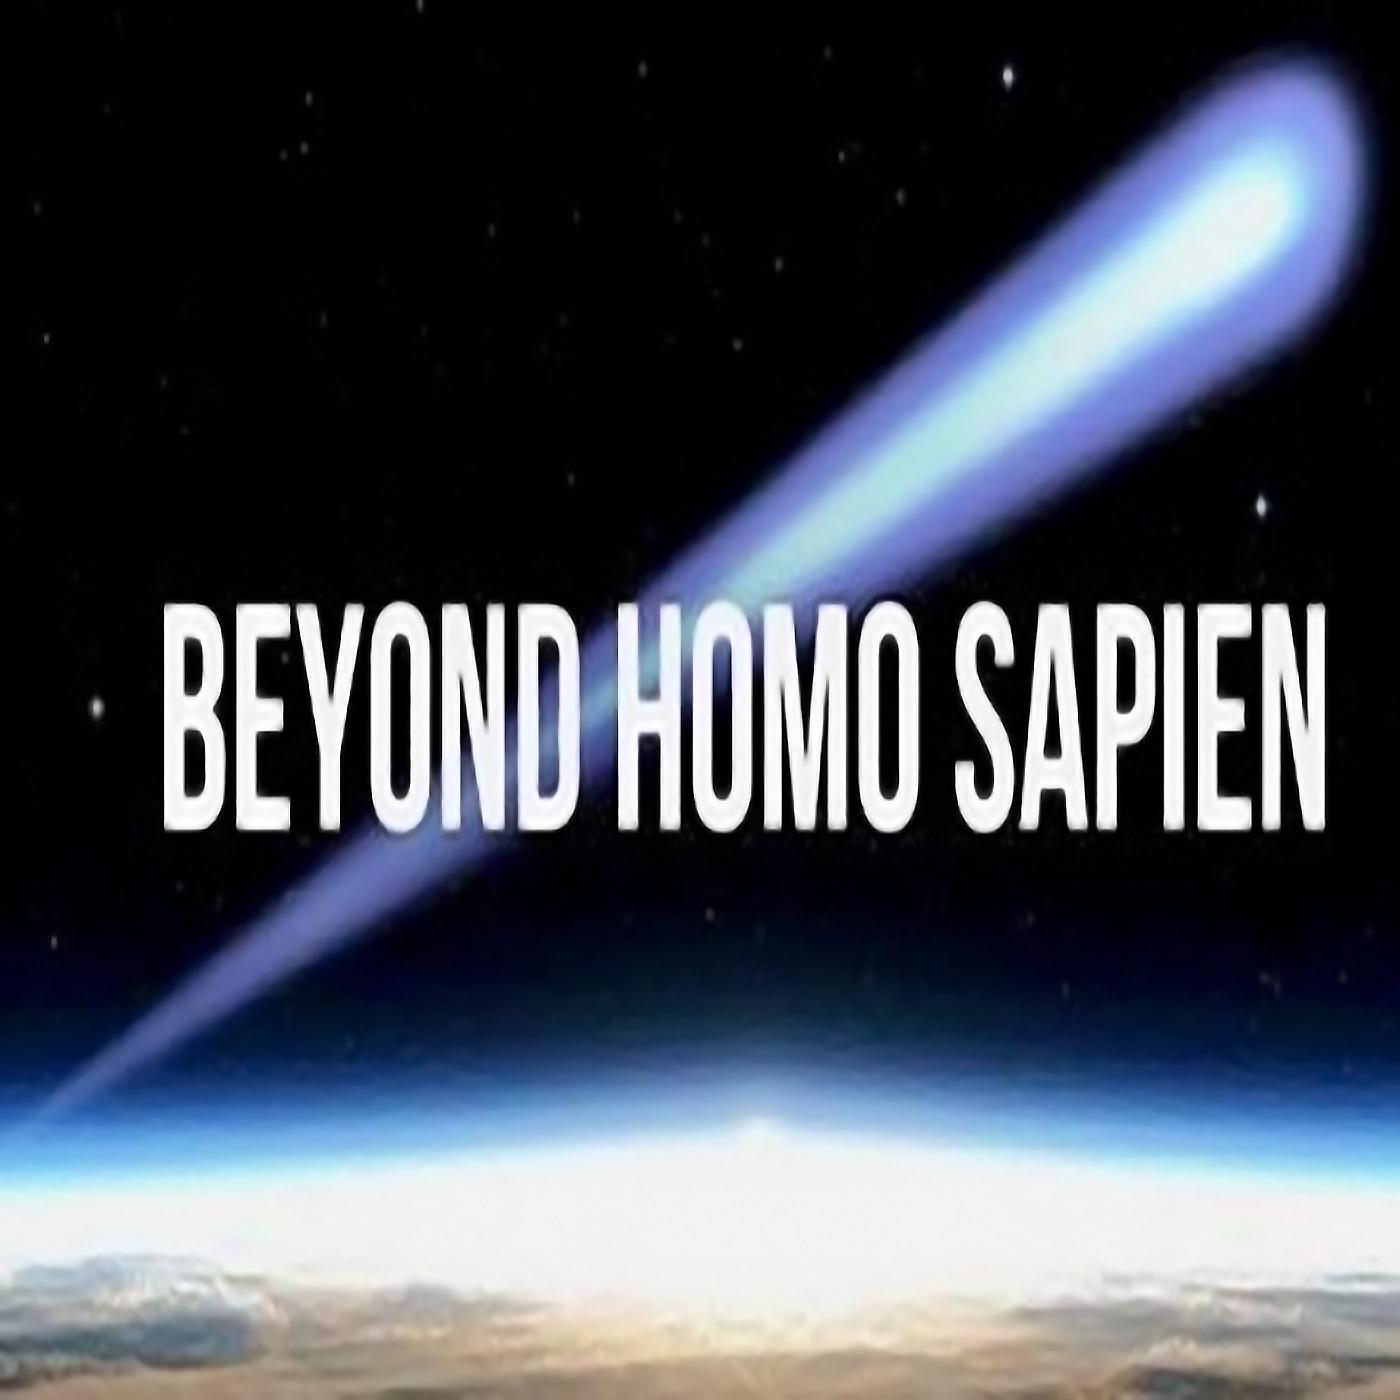 Beyond Homo Sapien show art